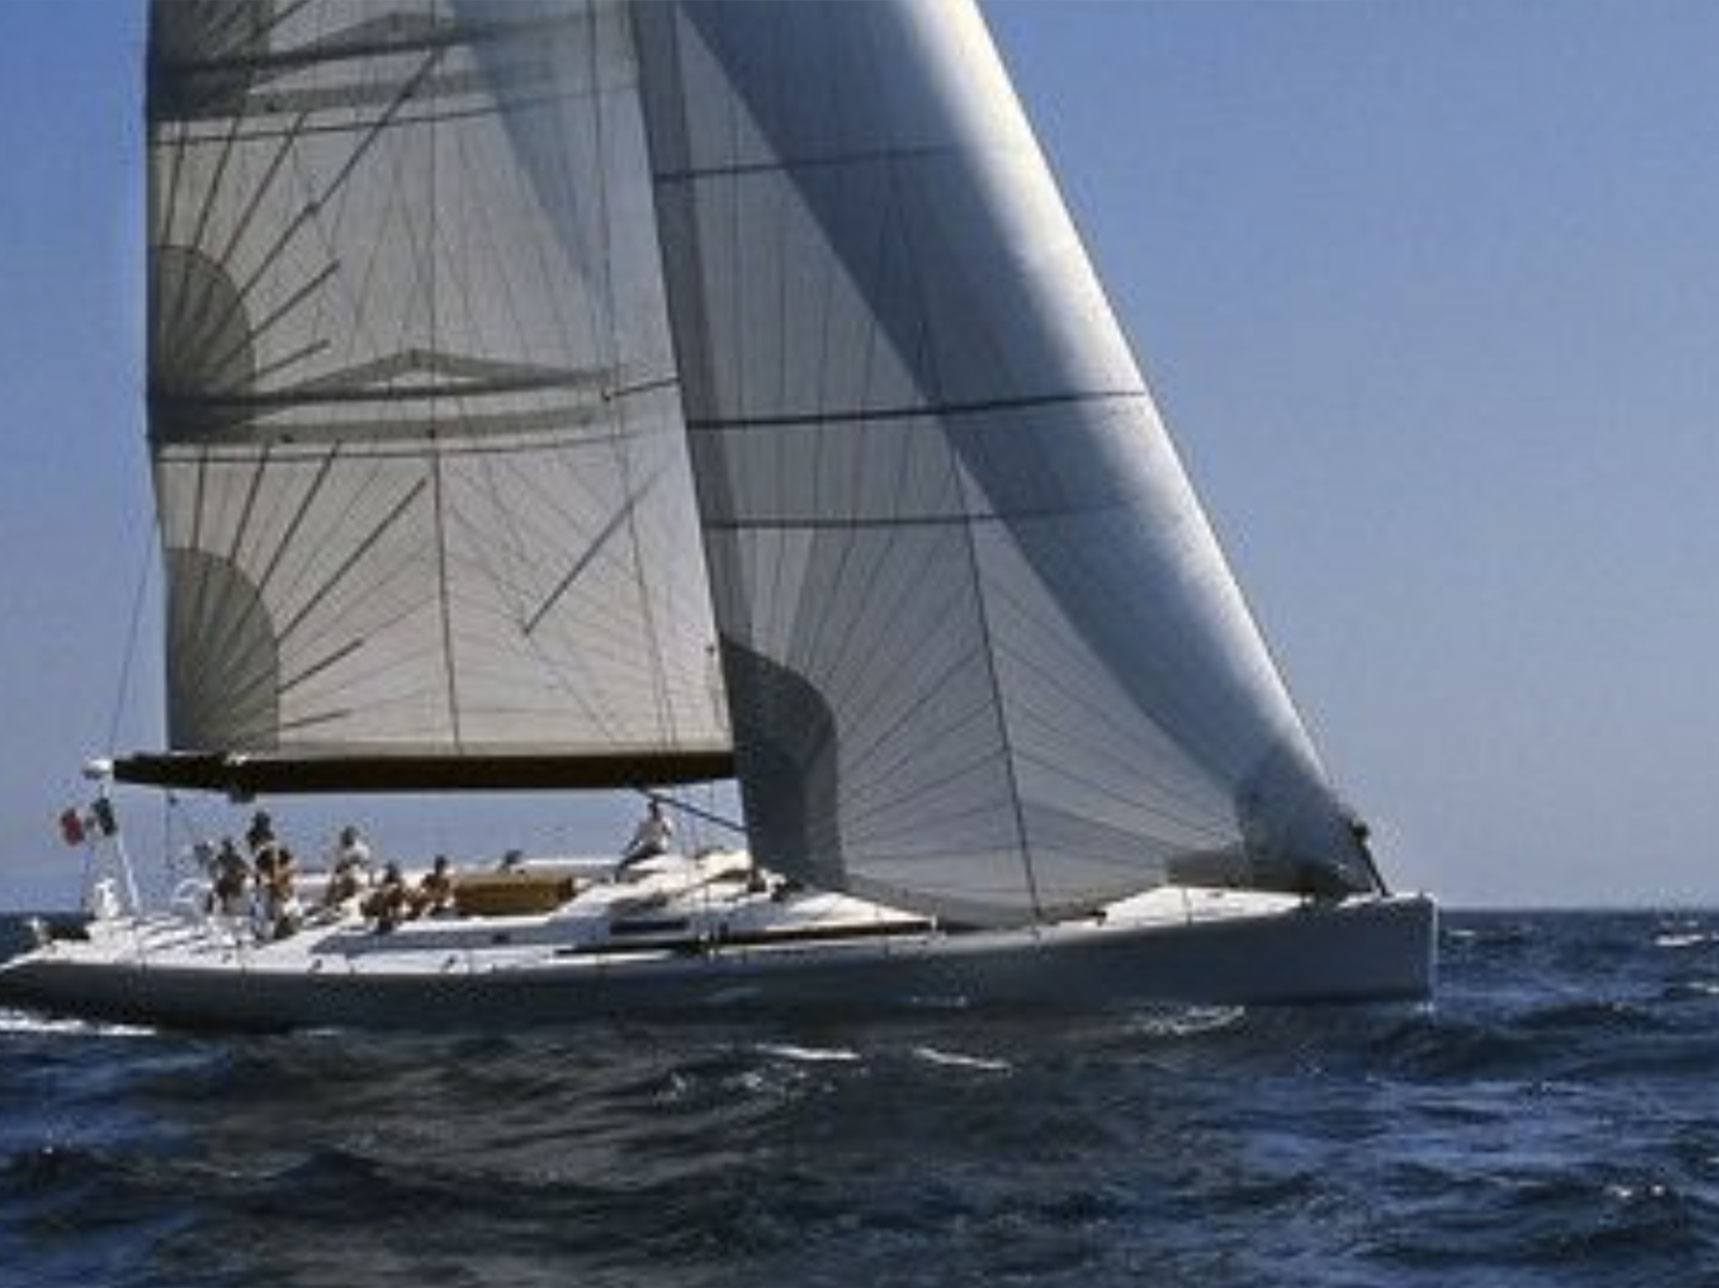 Racing Sailboats For Sale